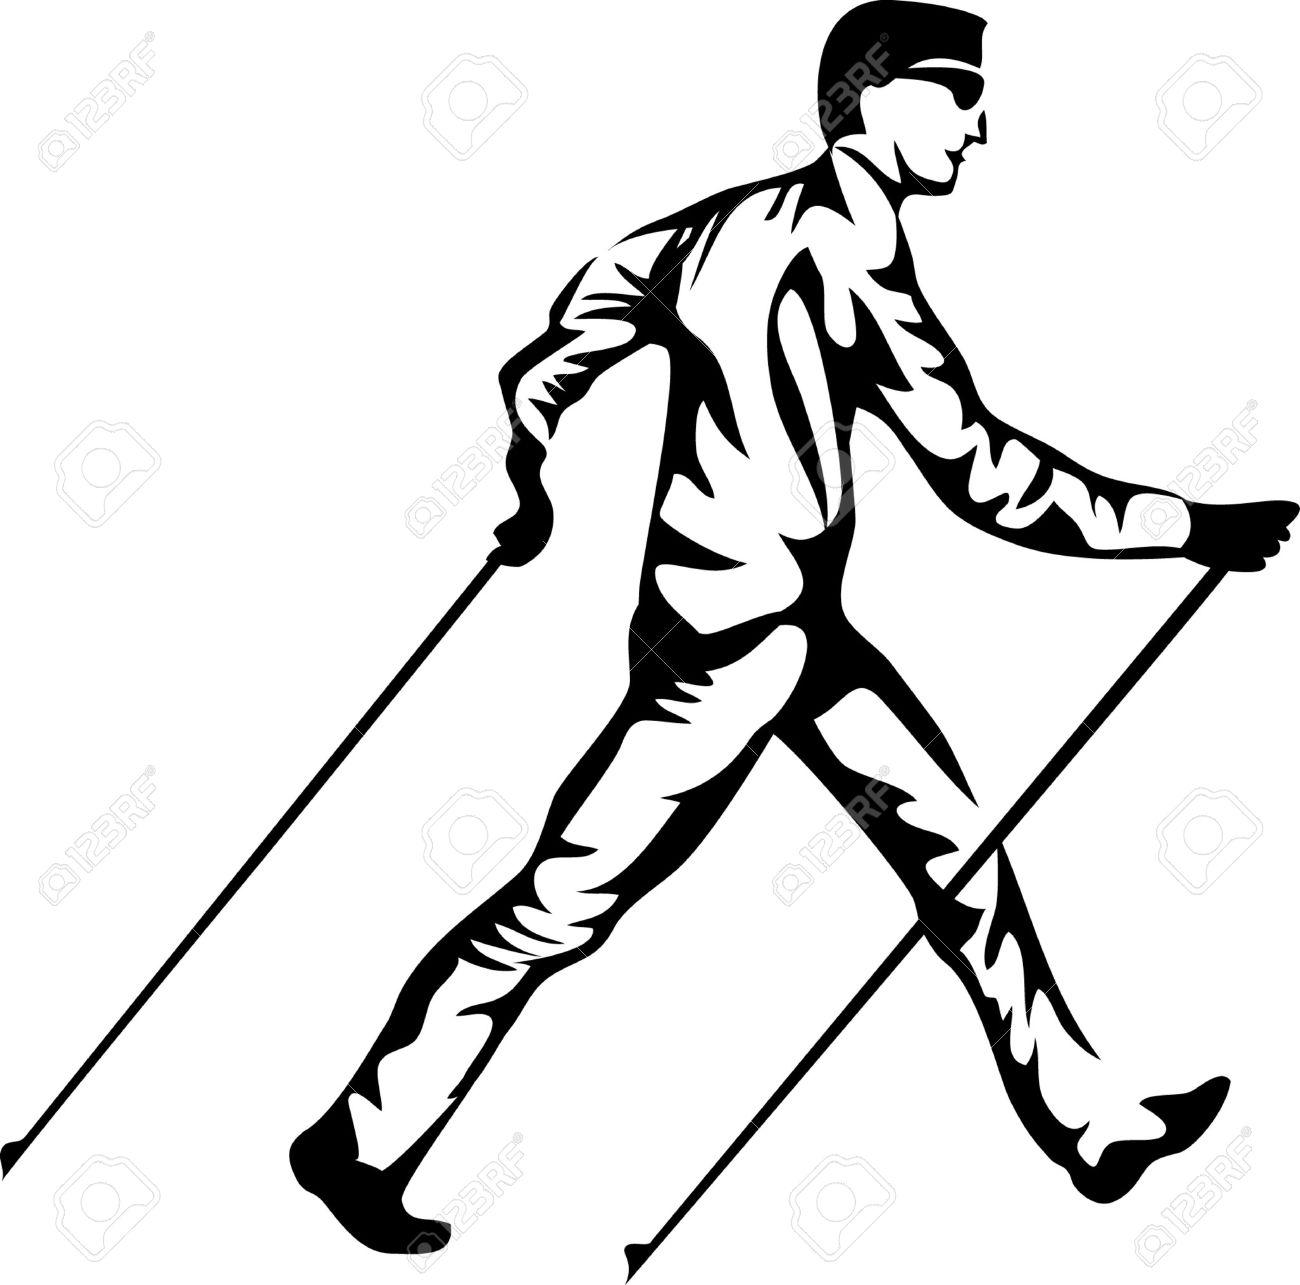 Nordic walking clipart.